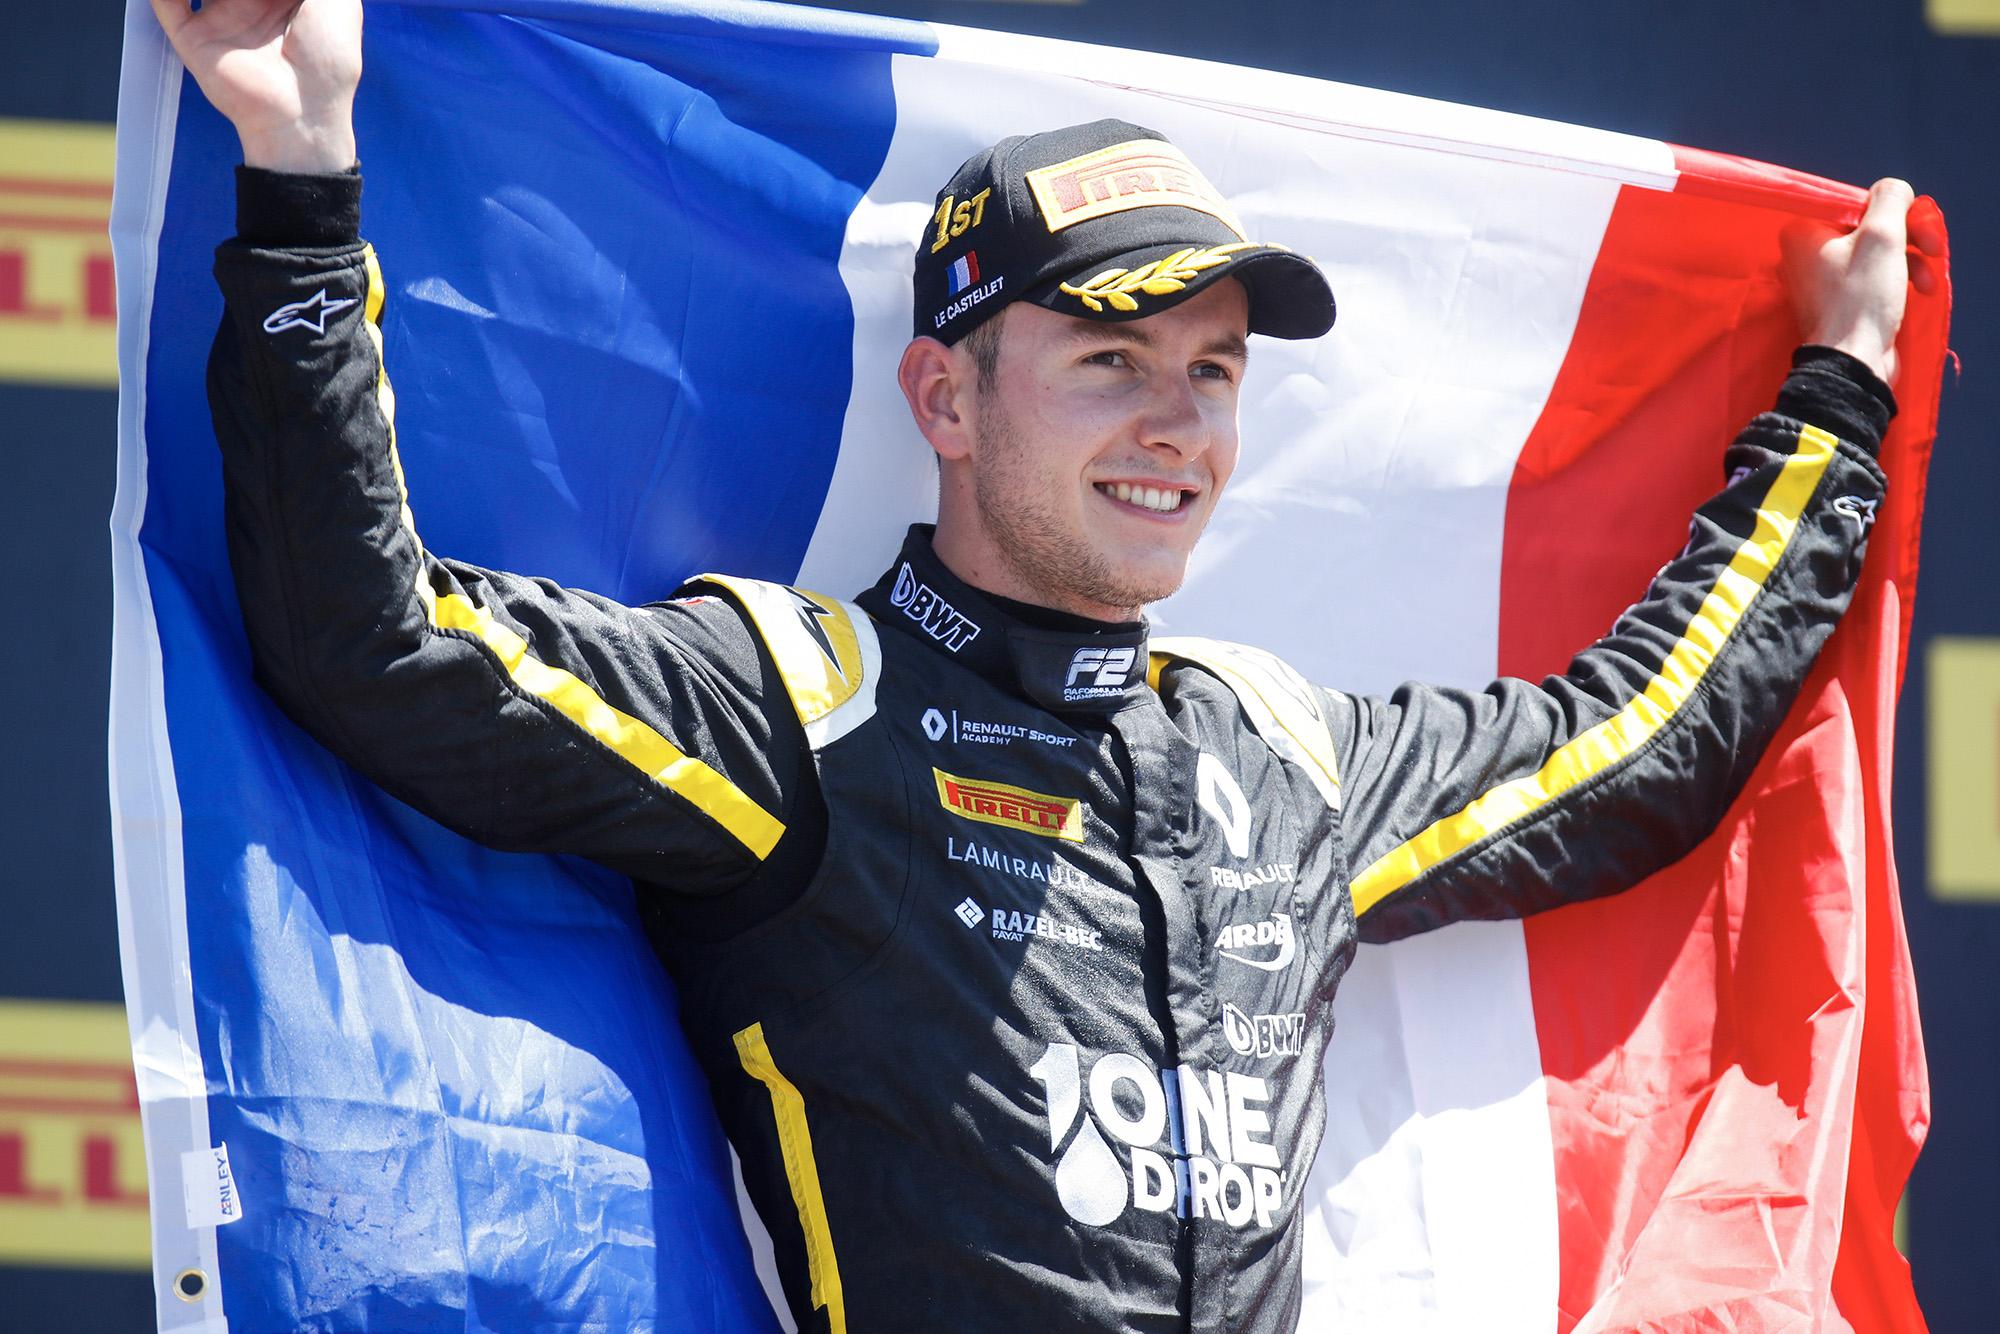 Anthoine Hubert celebrates winning at Paul Ricard in the 2019 Formula 2 season